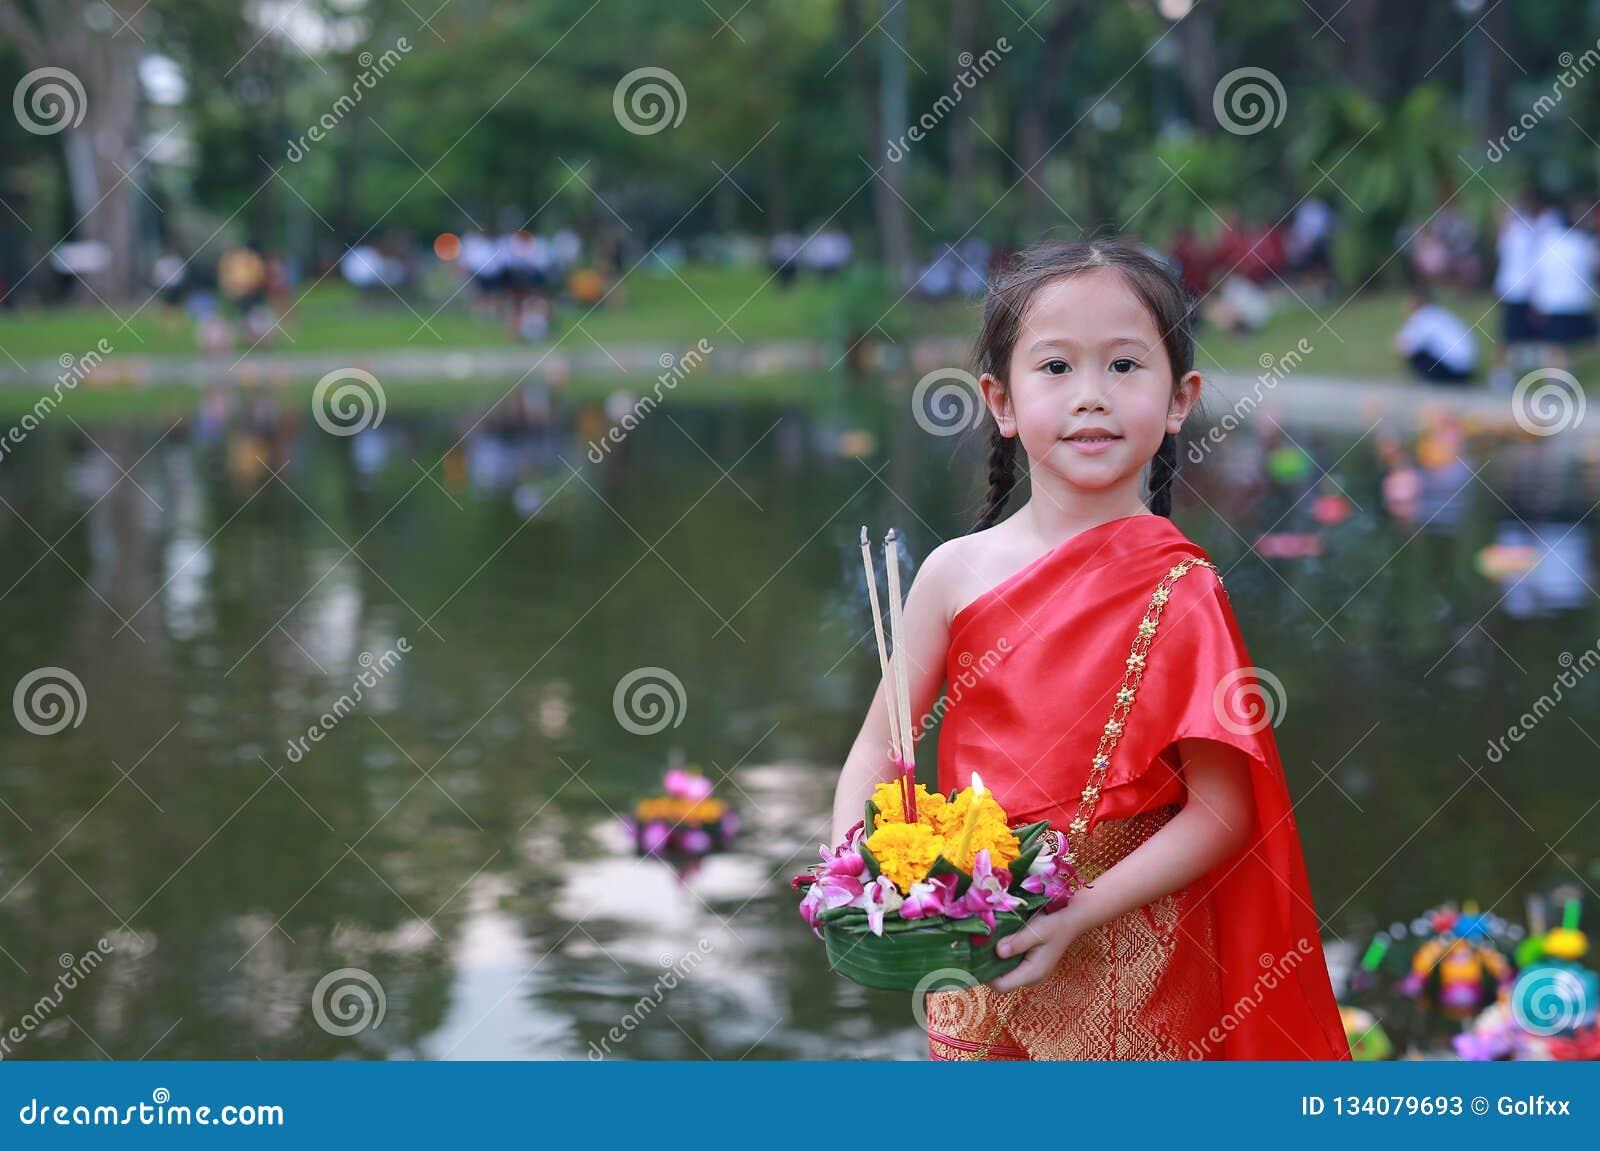 Loy Krathong-festival, Aziatisch Kindmeisje in Thaise traditionele kleding met holding krathong voor vergiffenisgodin Ganges aan